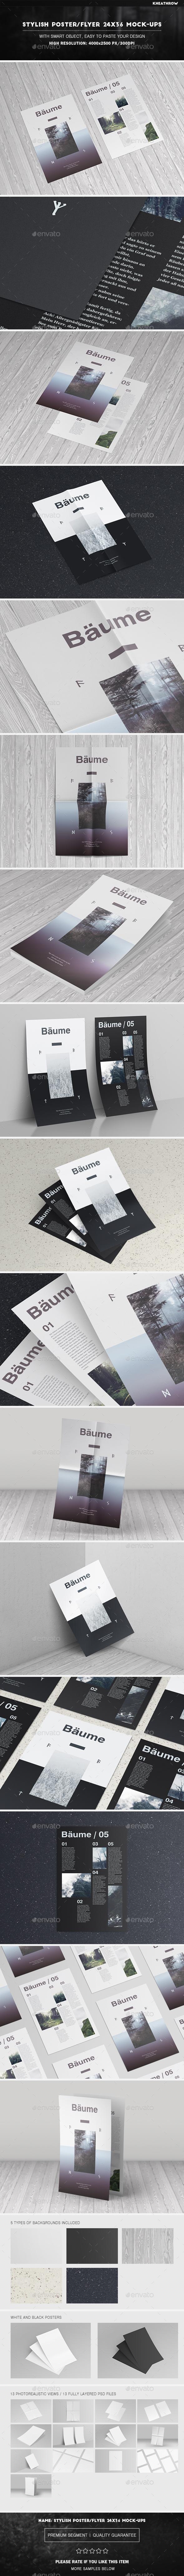 Stylish Poster / Flyer 24x36 Mock-Ups - Product Mock-Ups Graphics